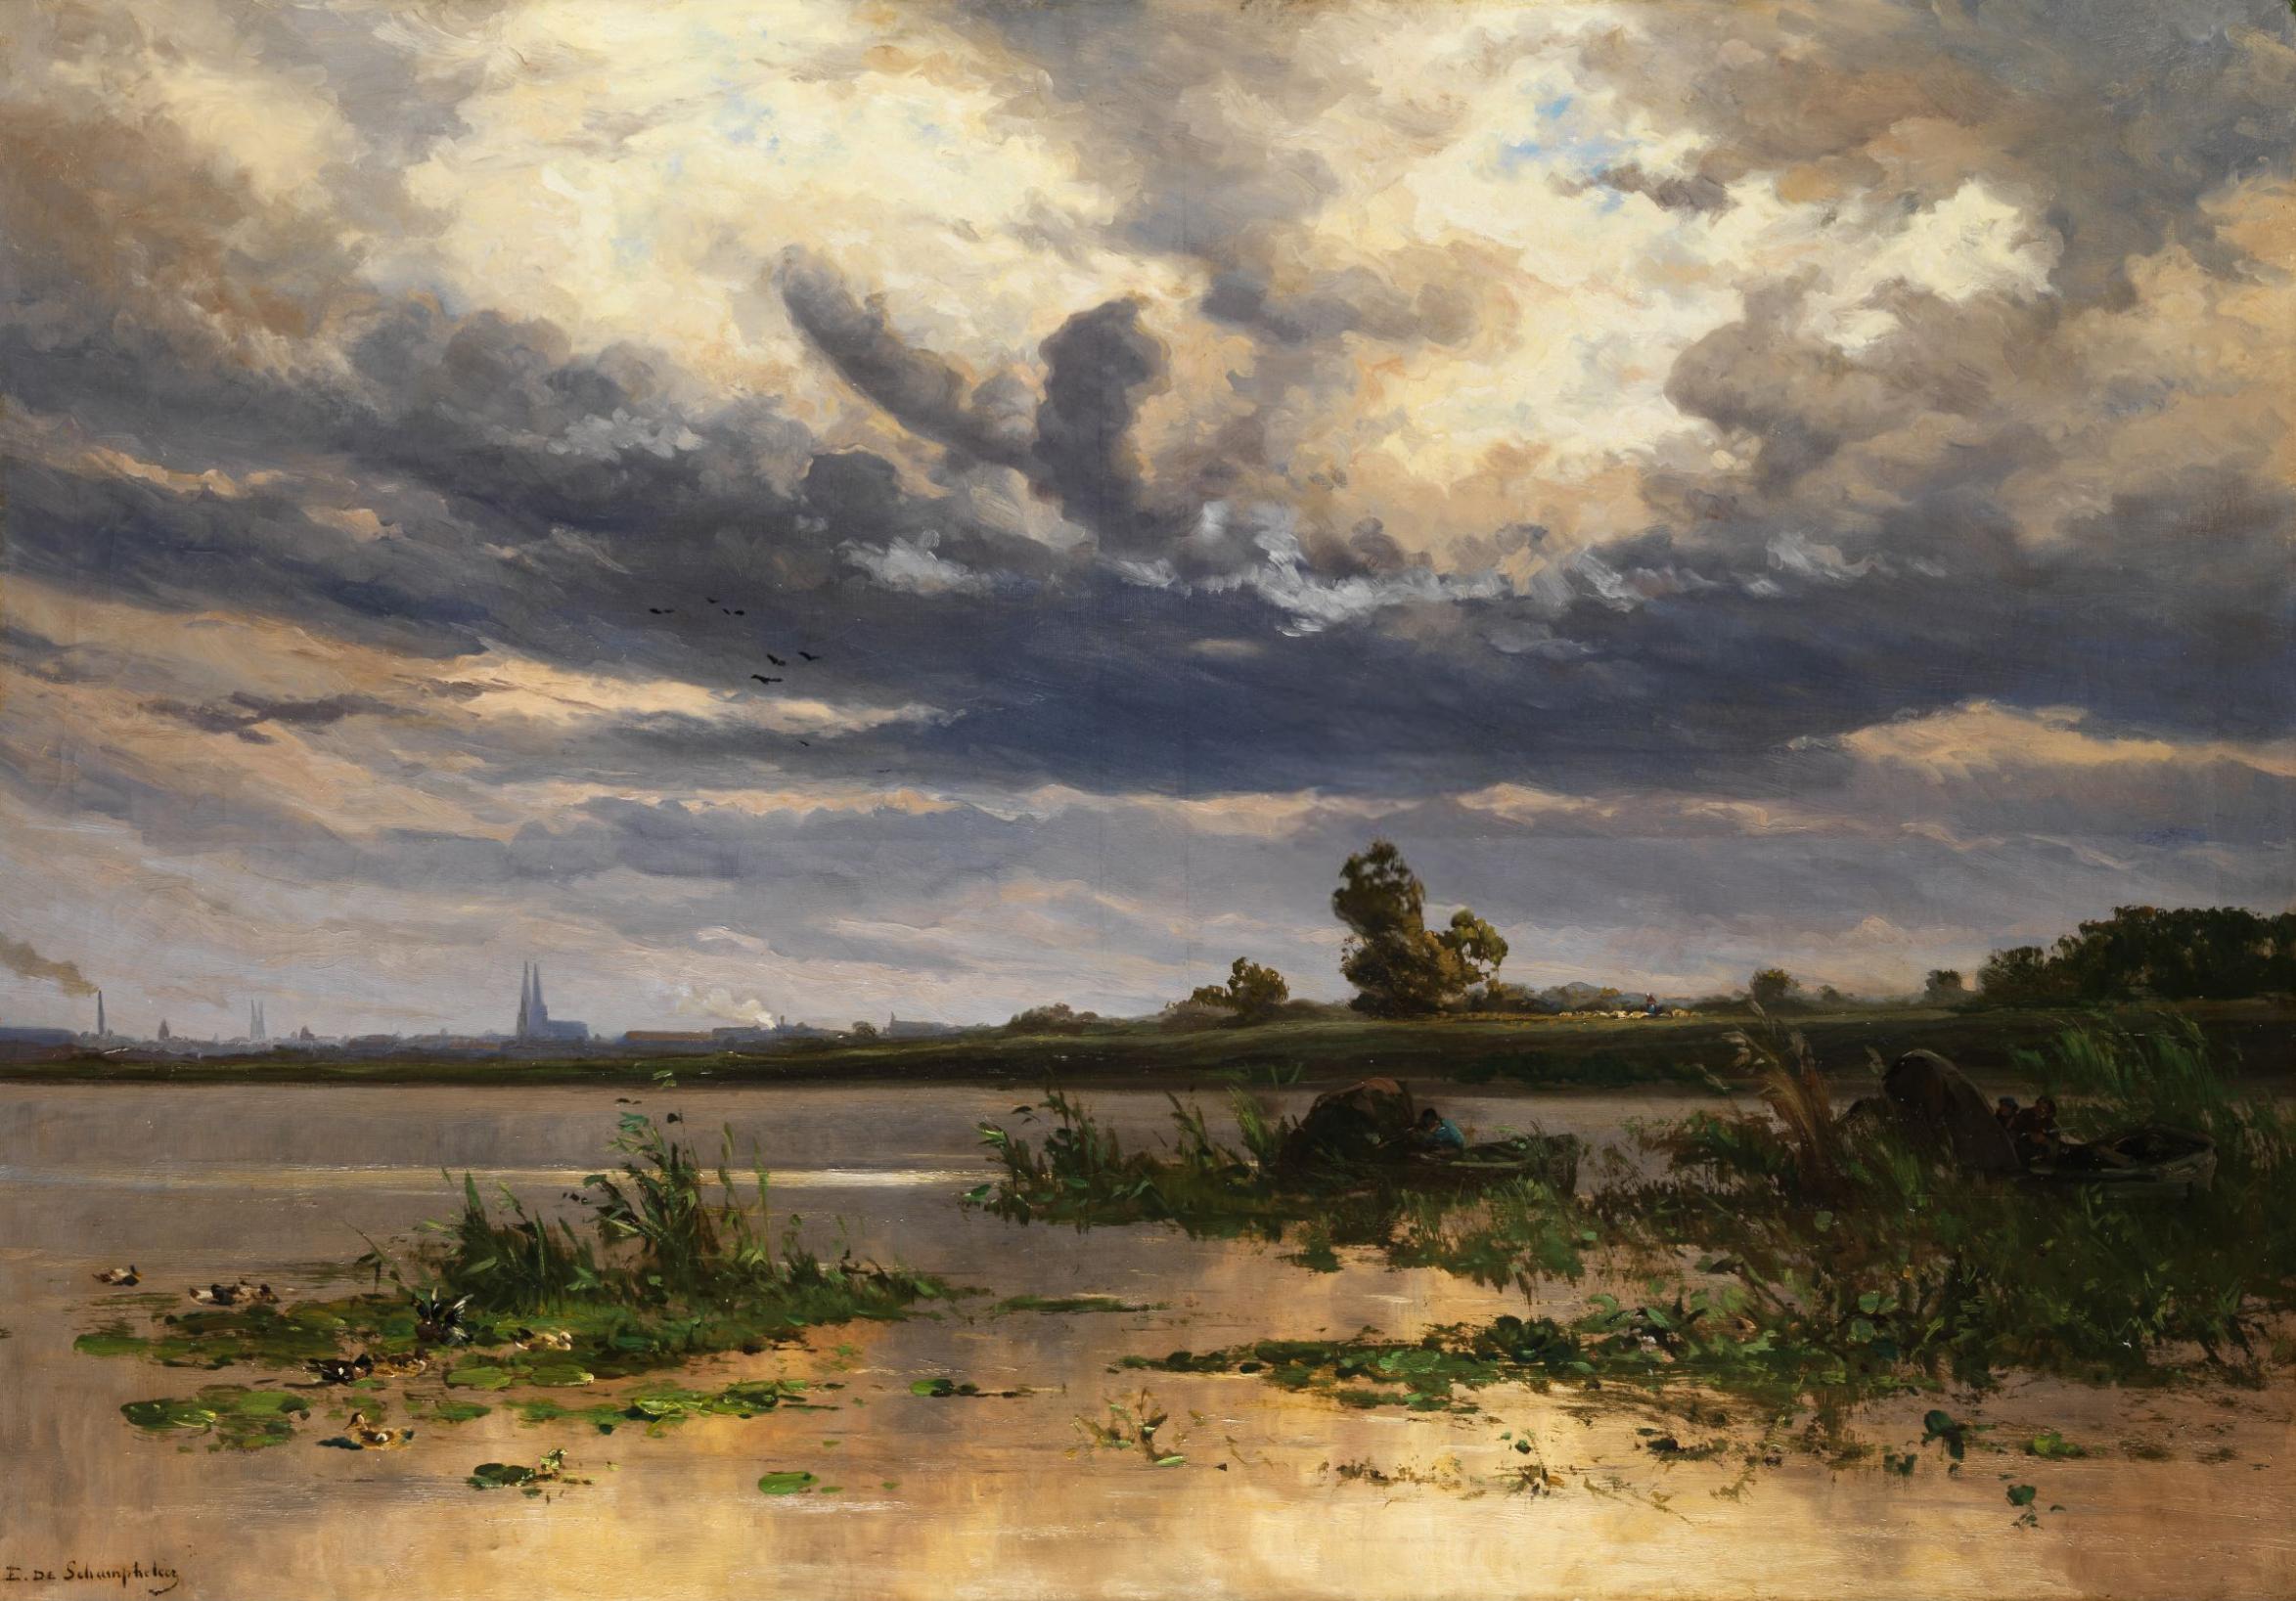 File:Edmond de schampheleer painting1.jpg.